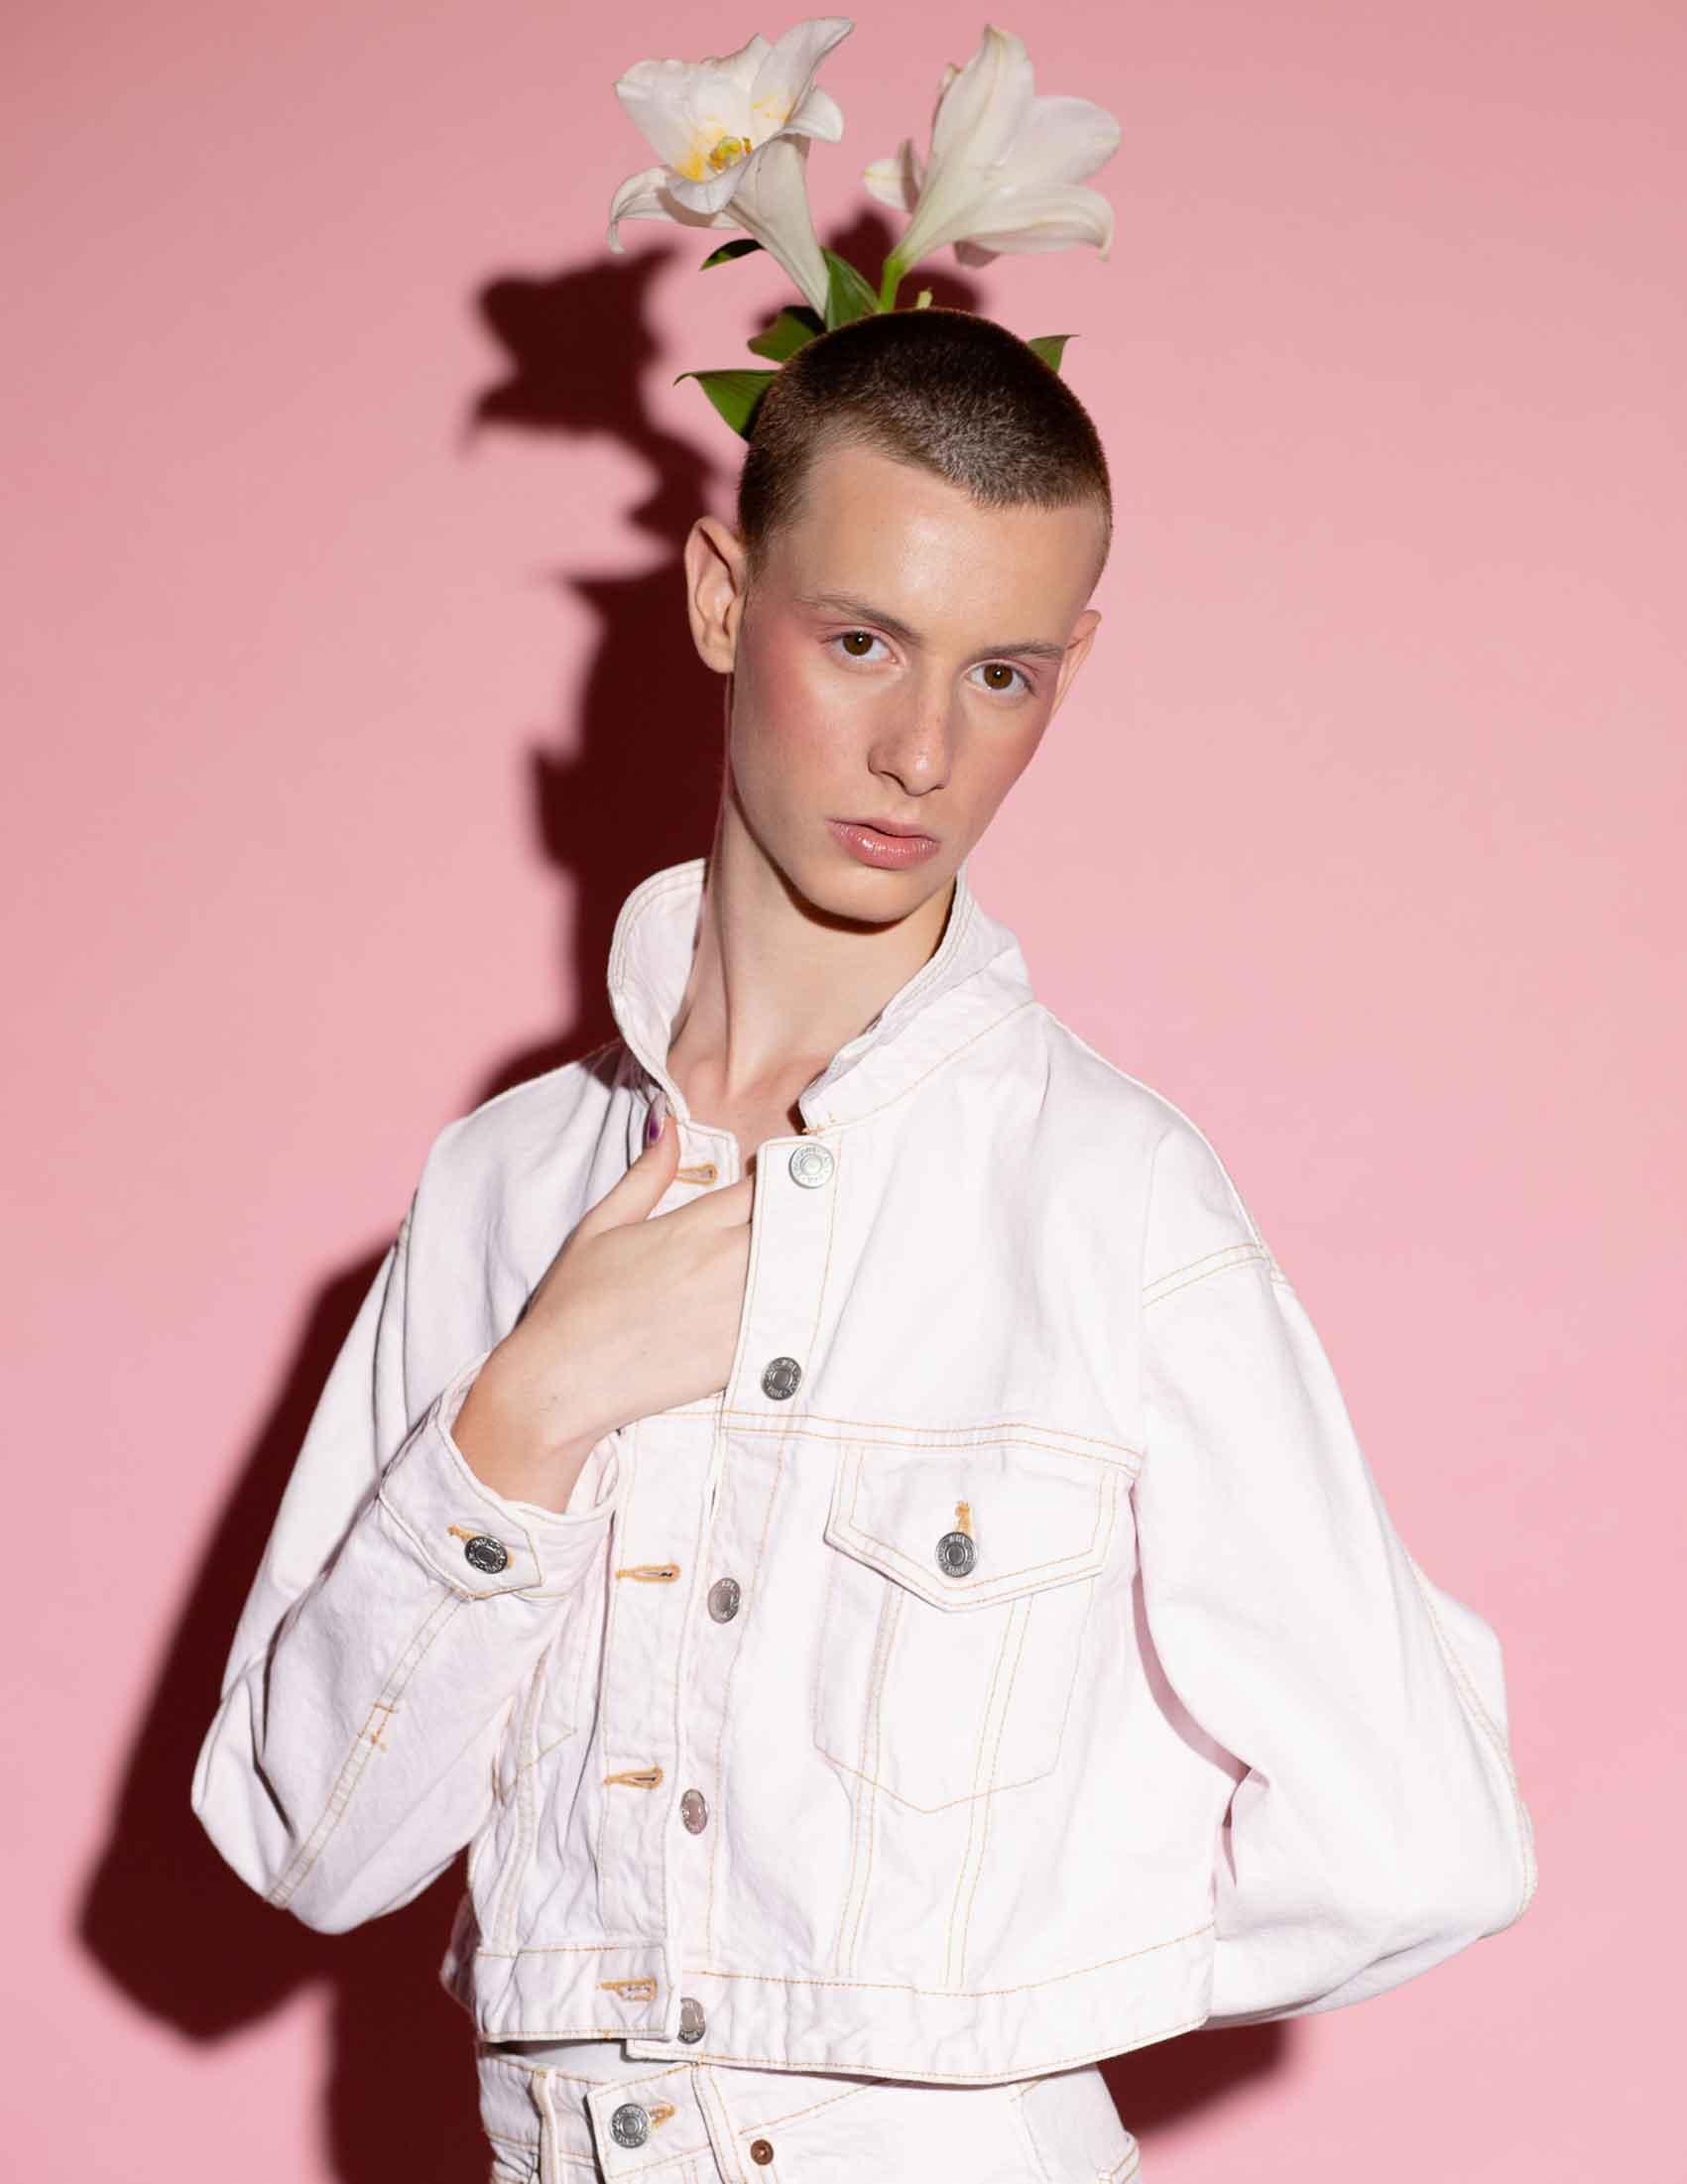 Photographer: Daniel Noy Dor Model: Idan Marin Stylist: Maayan Naftali Makeup: Roni Ben Ami Assistant: Tomer Hershkovitz-20